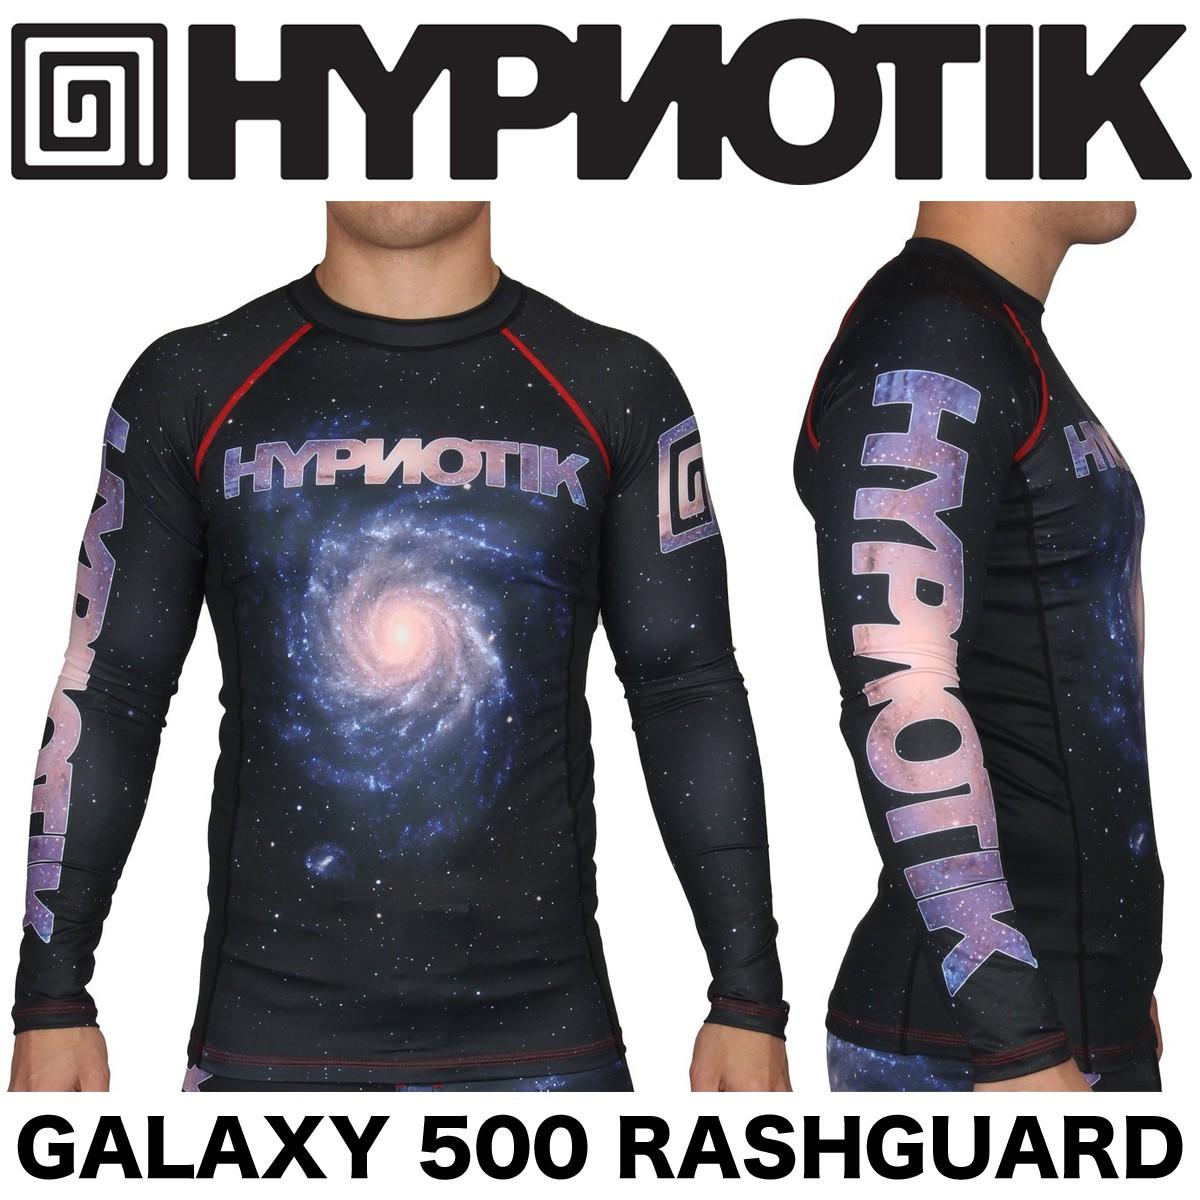 HYPNOTIK GALAXY 500 RASHGUARD